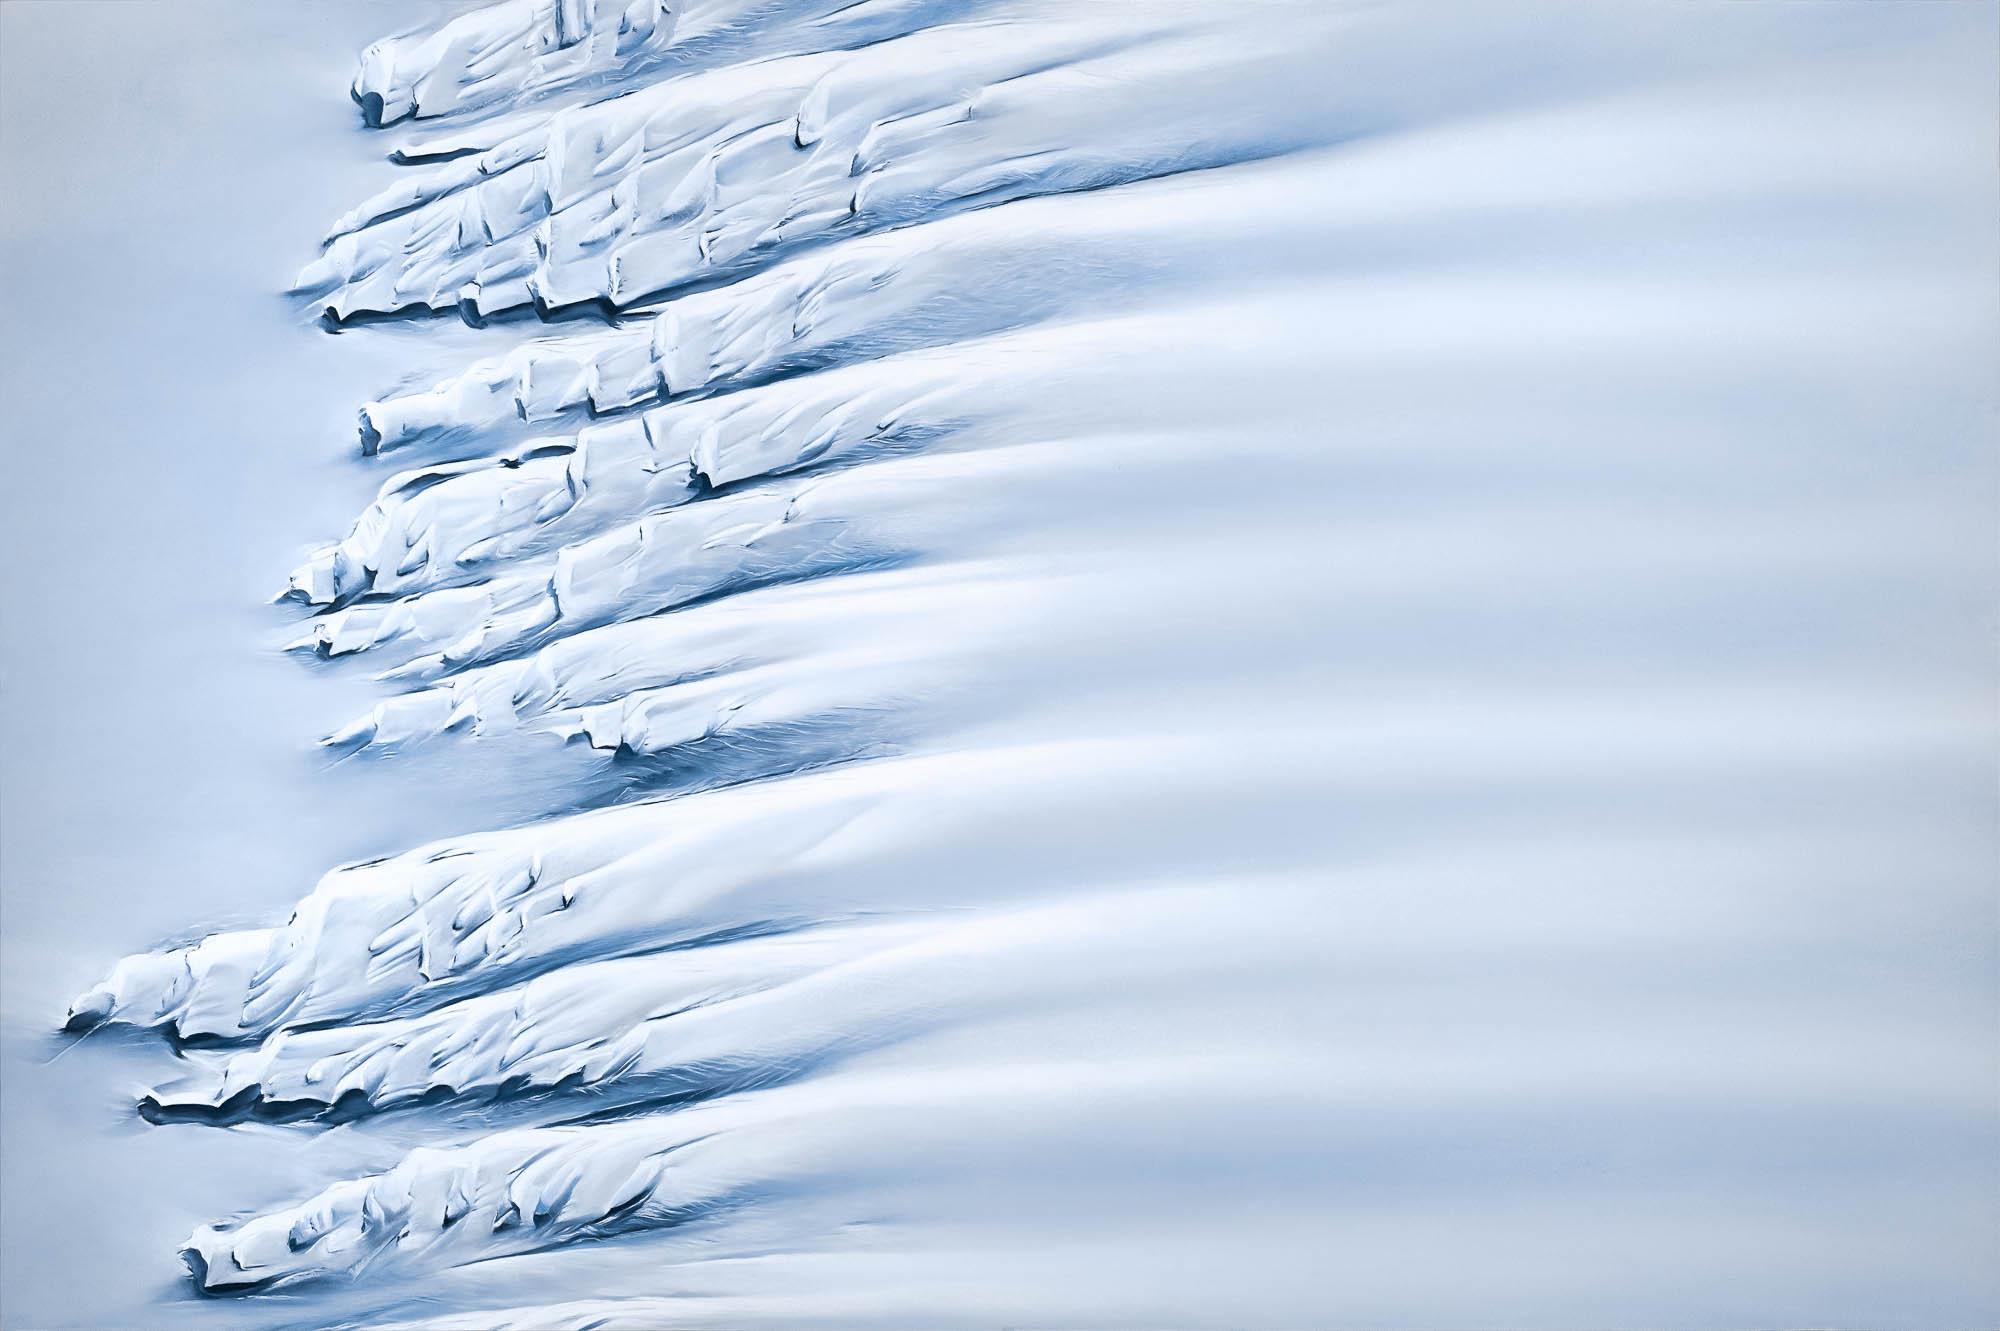 Getz Ice Shelf Antarctica 744557708S.13350548448W 40x60inches 2018